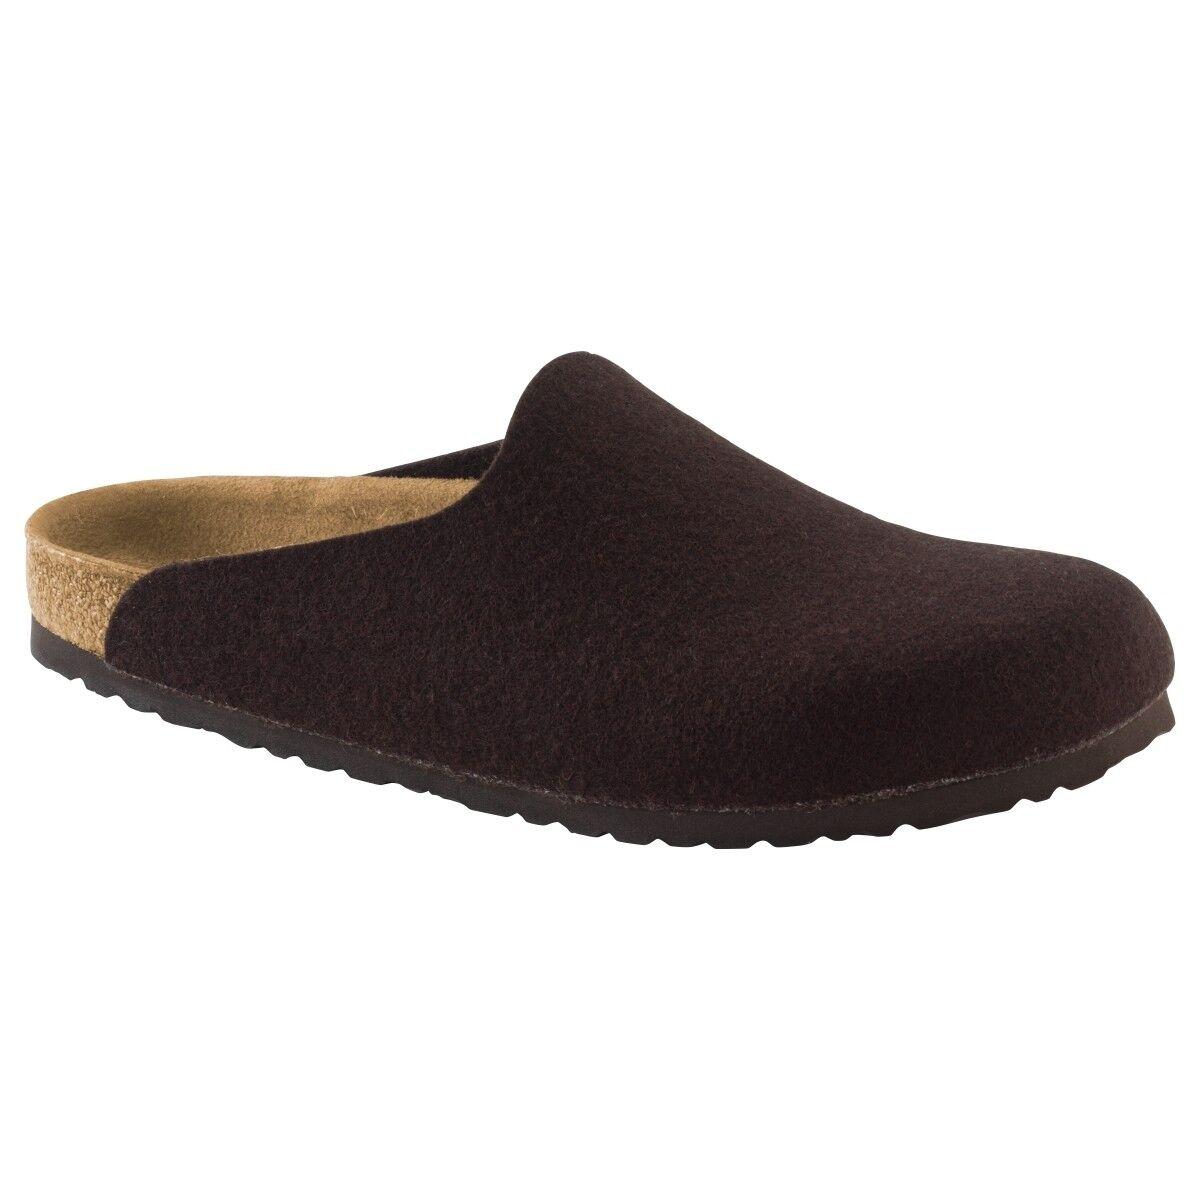 Birkenstock Amsterdam Wollfilz Clogs Schuhe 1001491 Pantoletten Weite normal